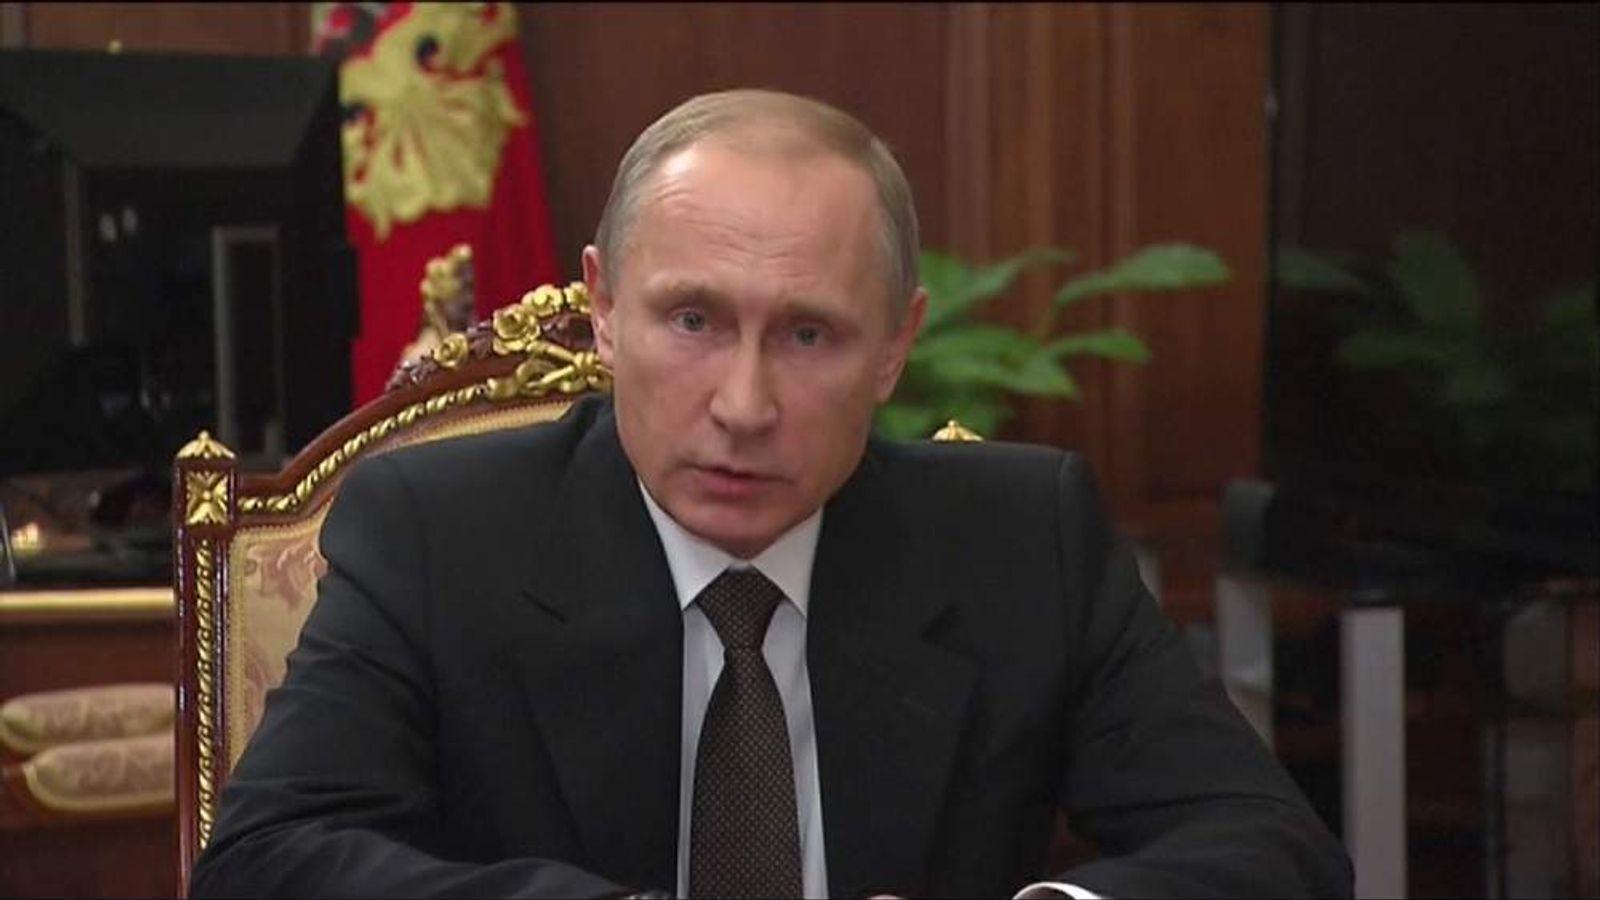 Russian President Vladimir Putin talks about Sinai plane bombing